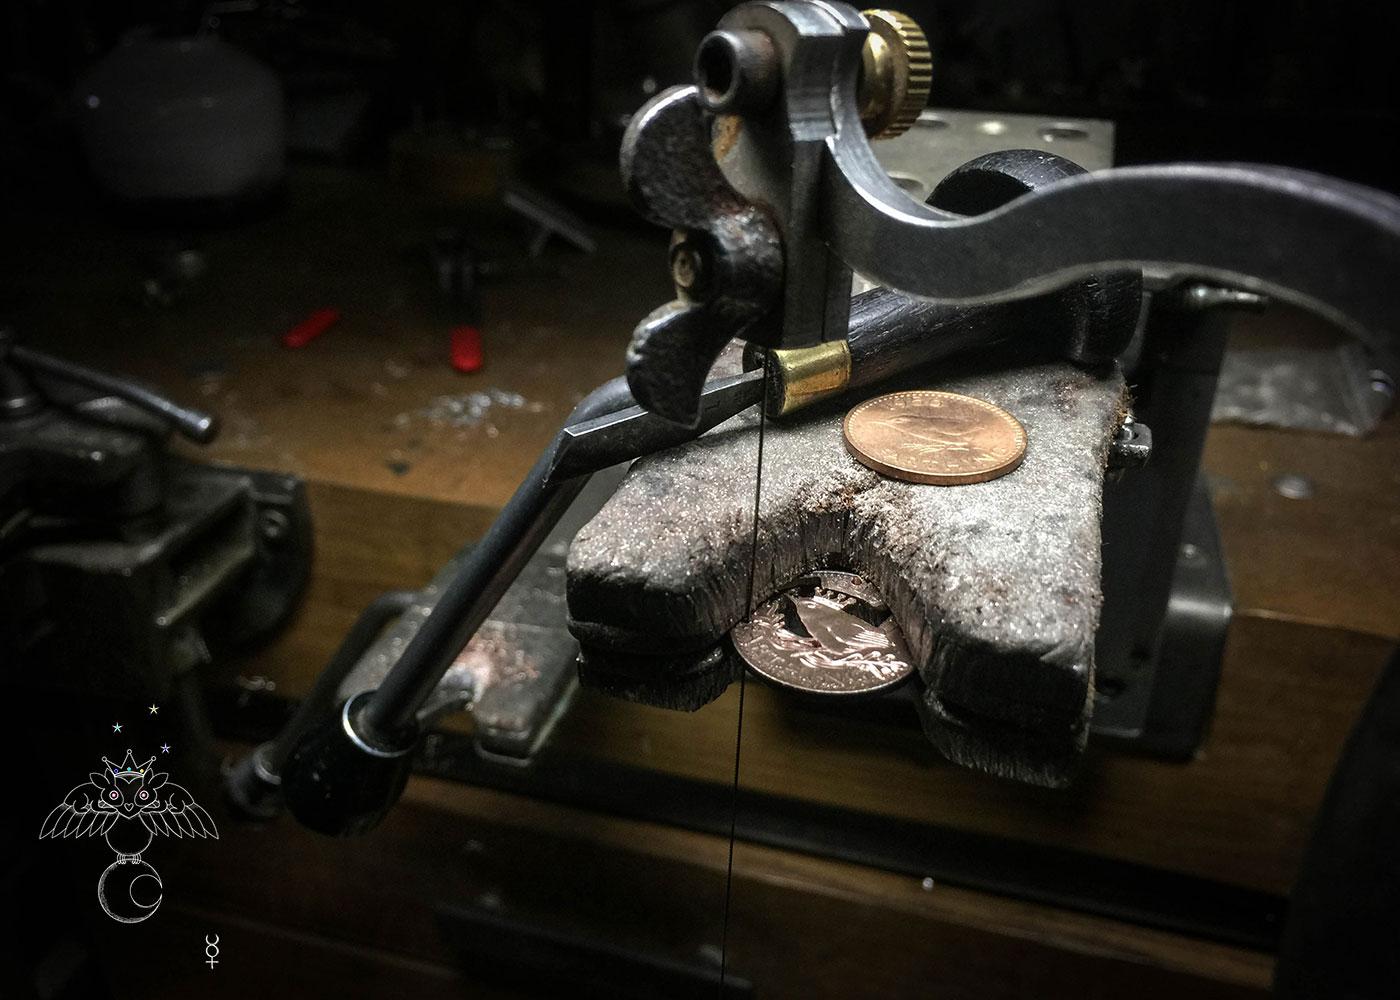 Jenny wren cut coin pendant